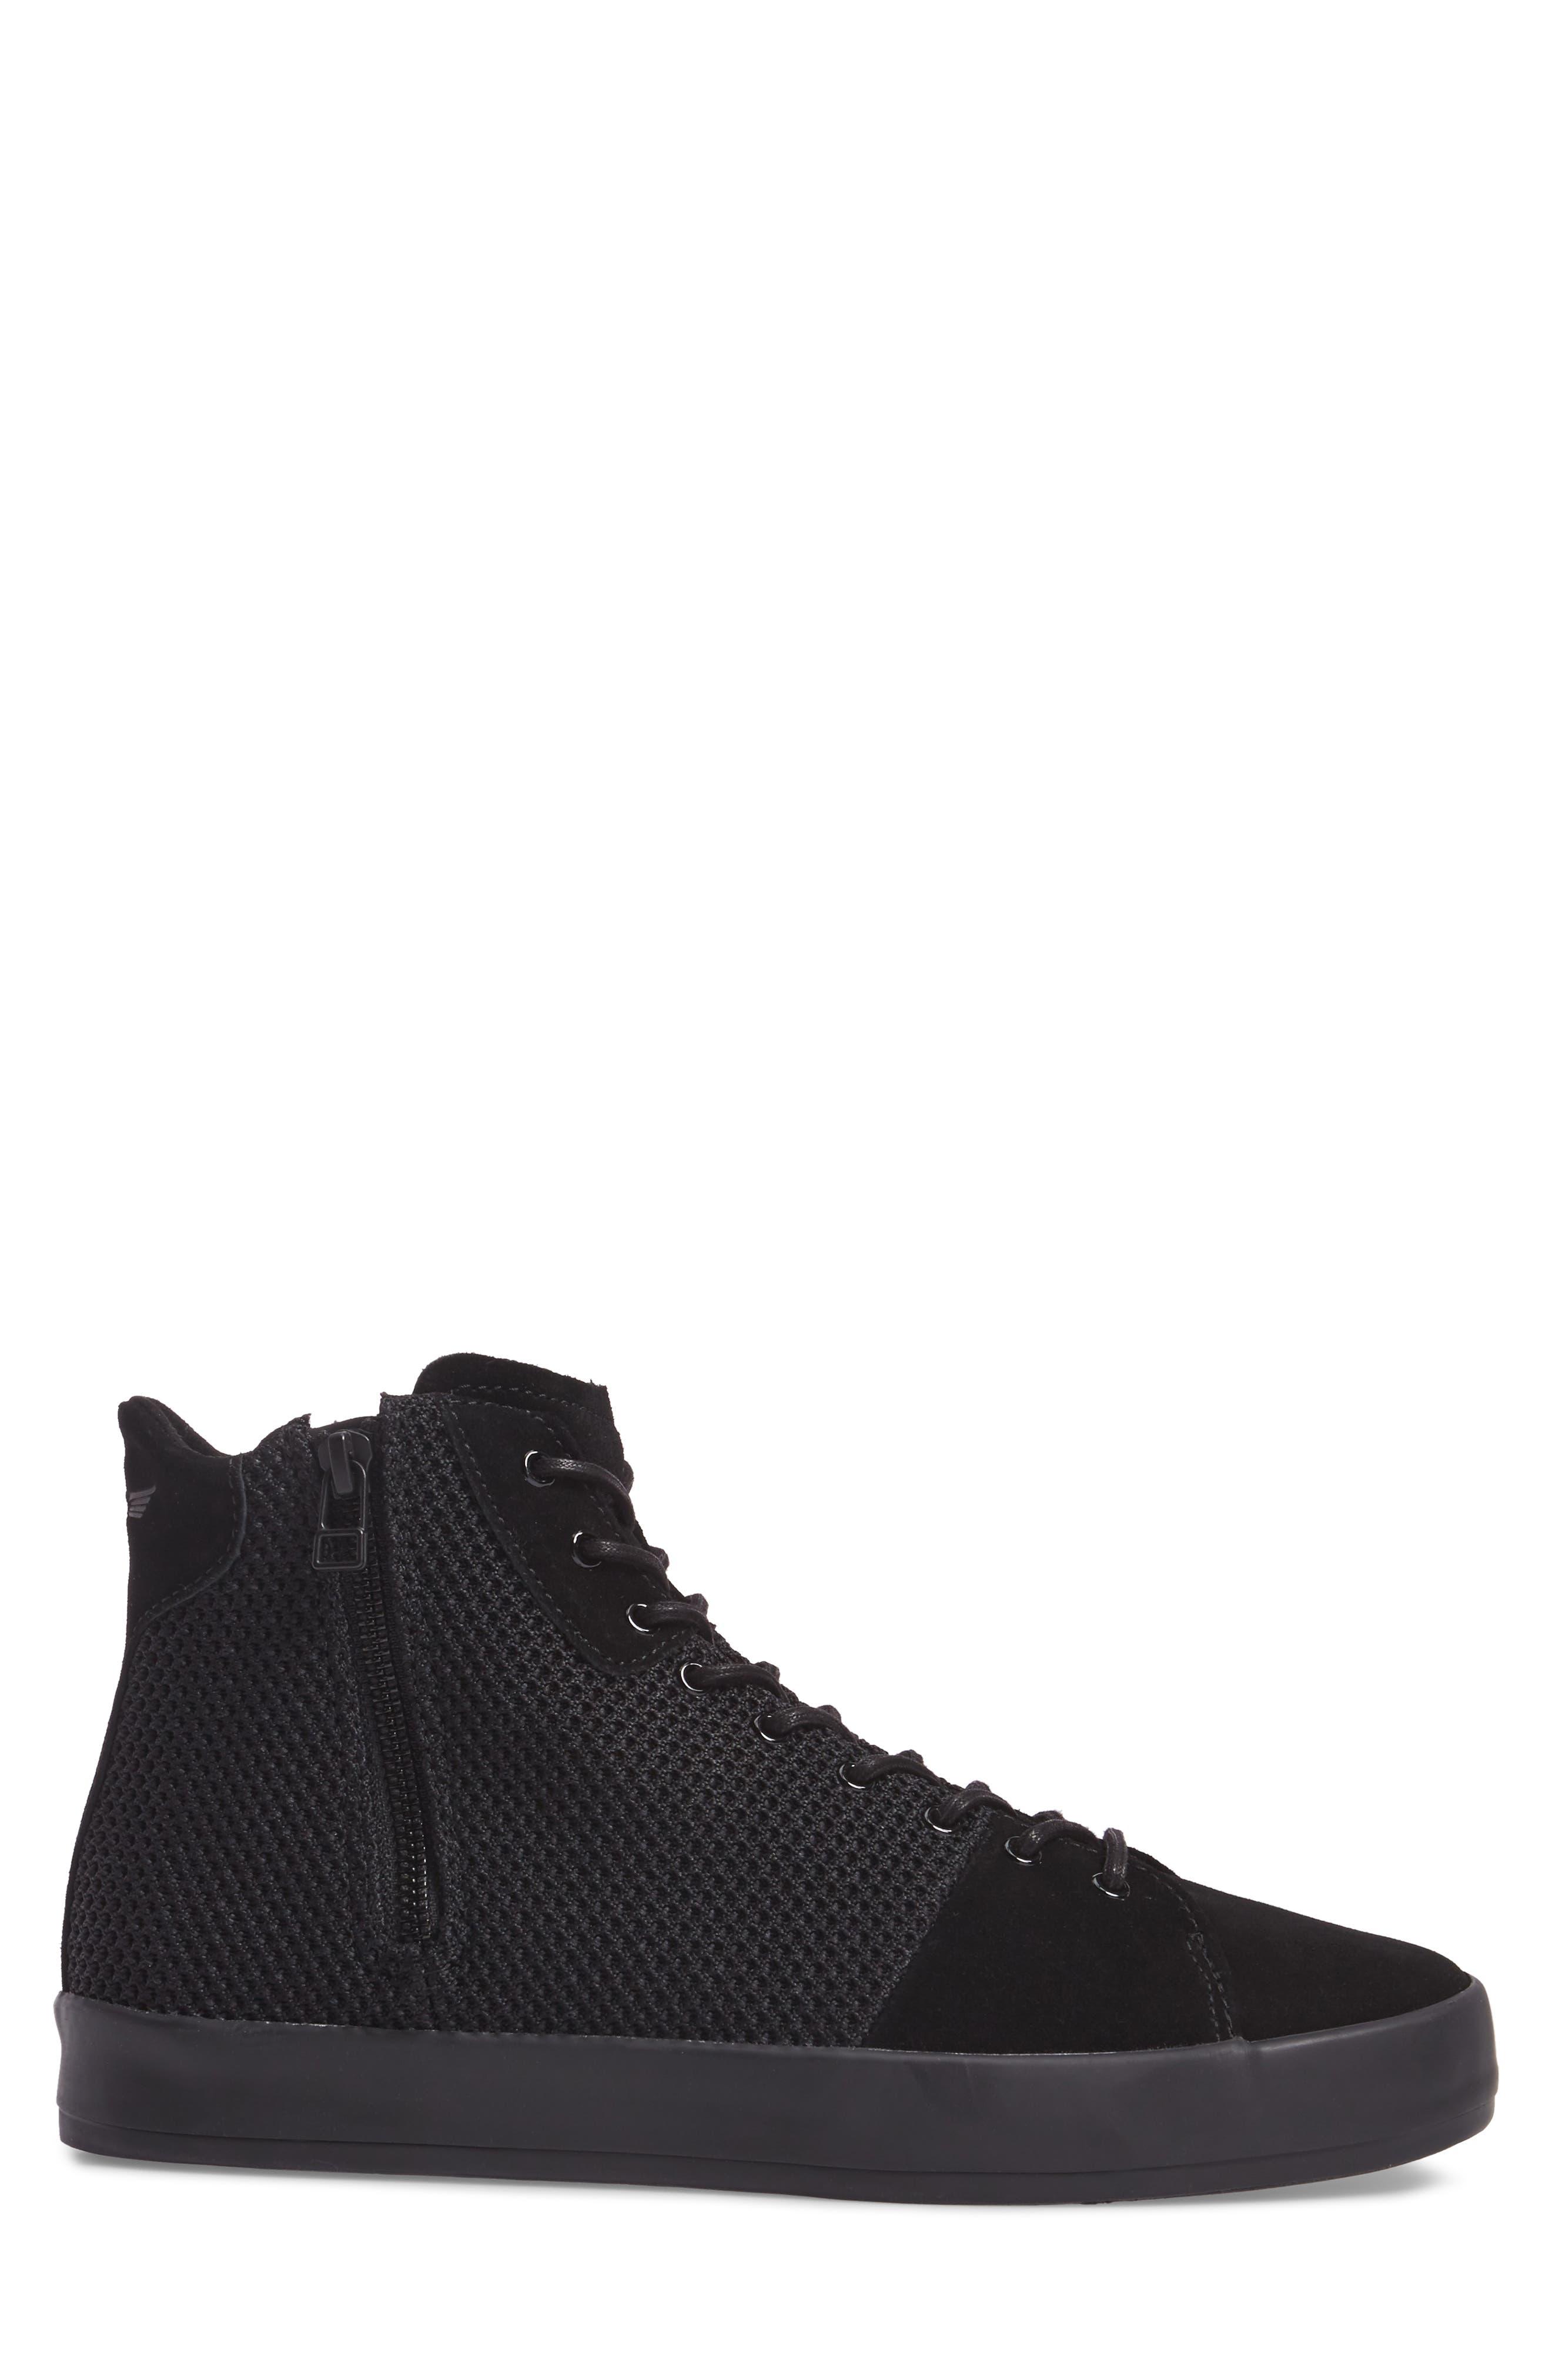 Carda Hi Sneaker,                             Alternate thumbnail 3, color,                             003